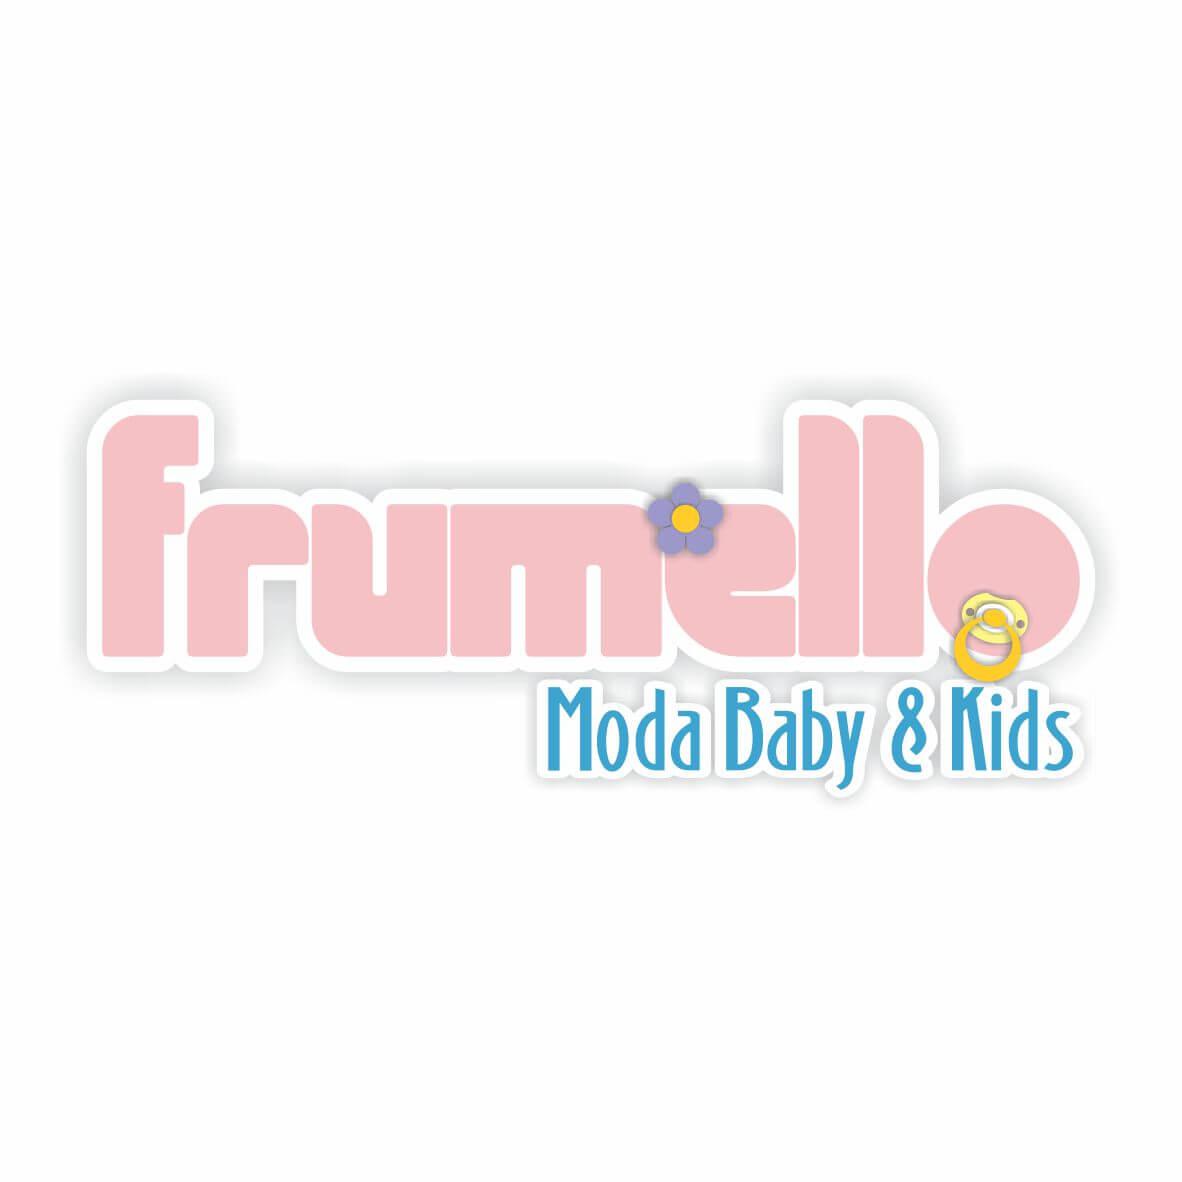 logomarca_frumello_moda_baby_kids